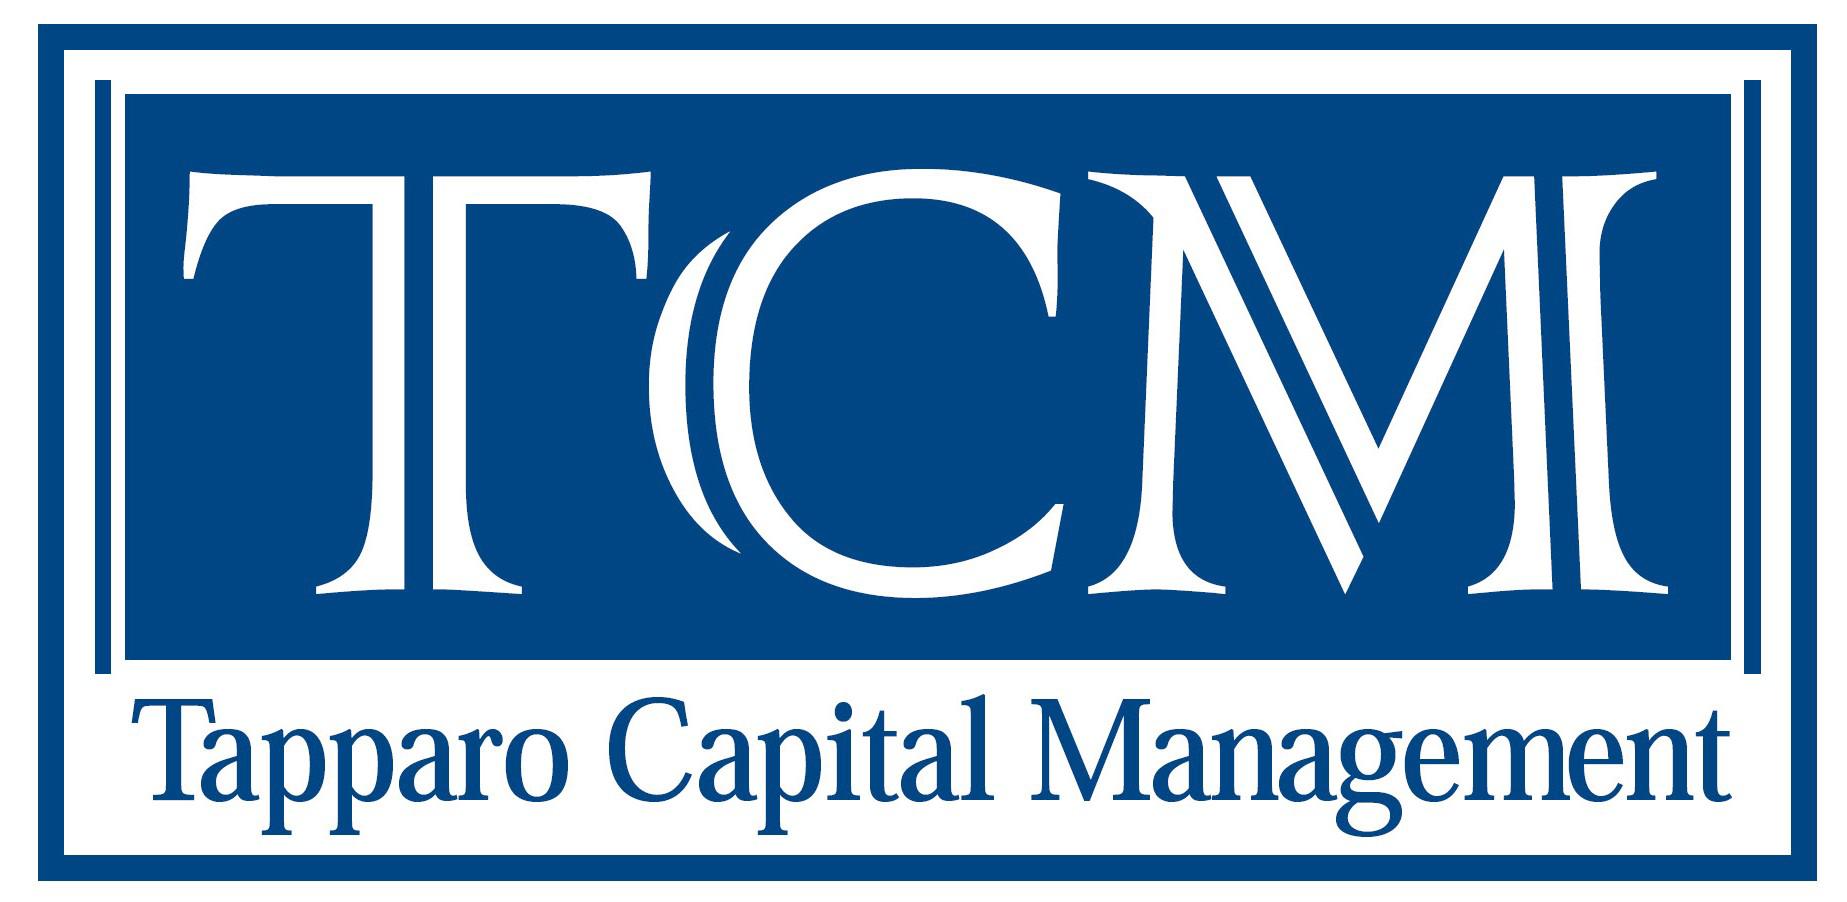 Tapparo Capital Management